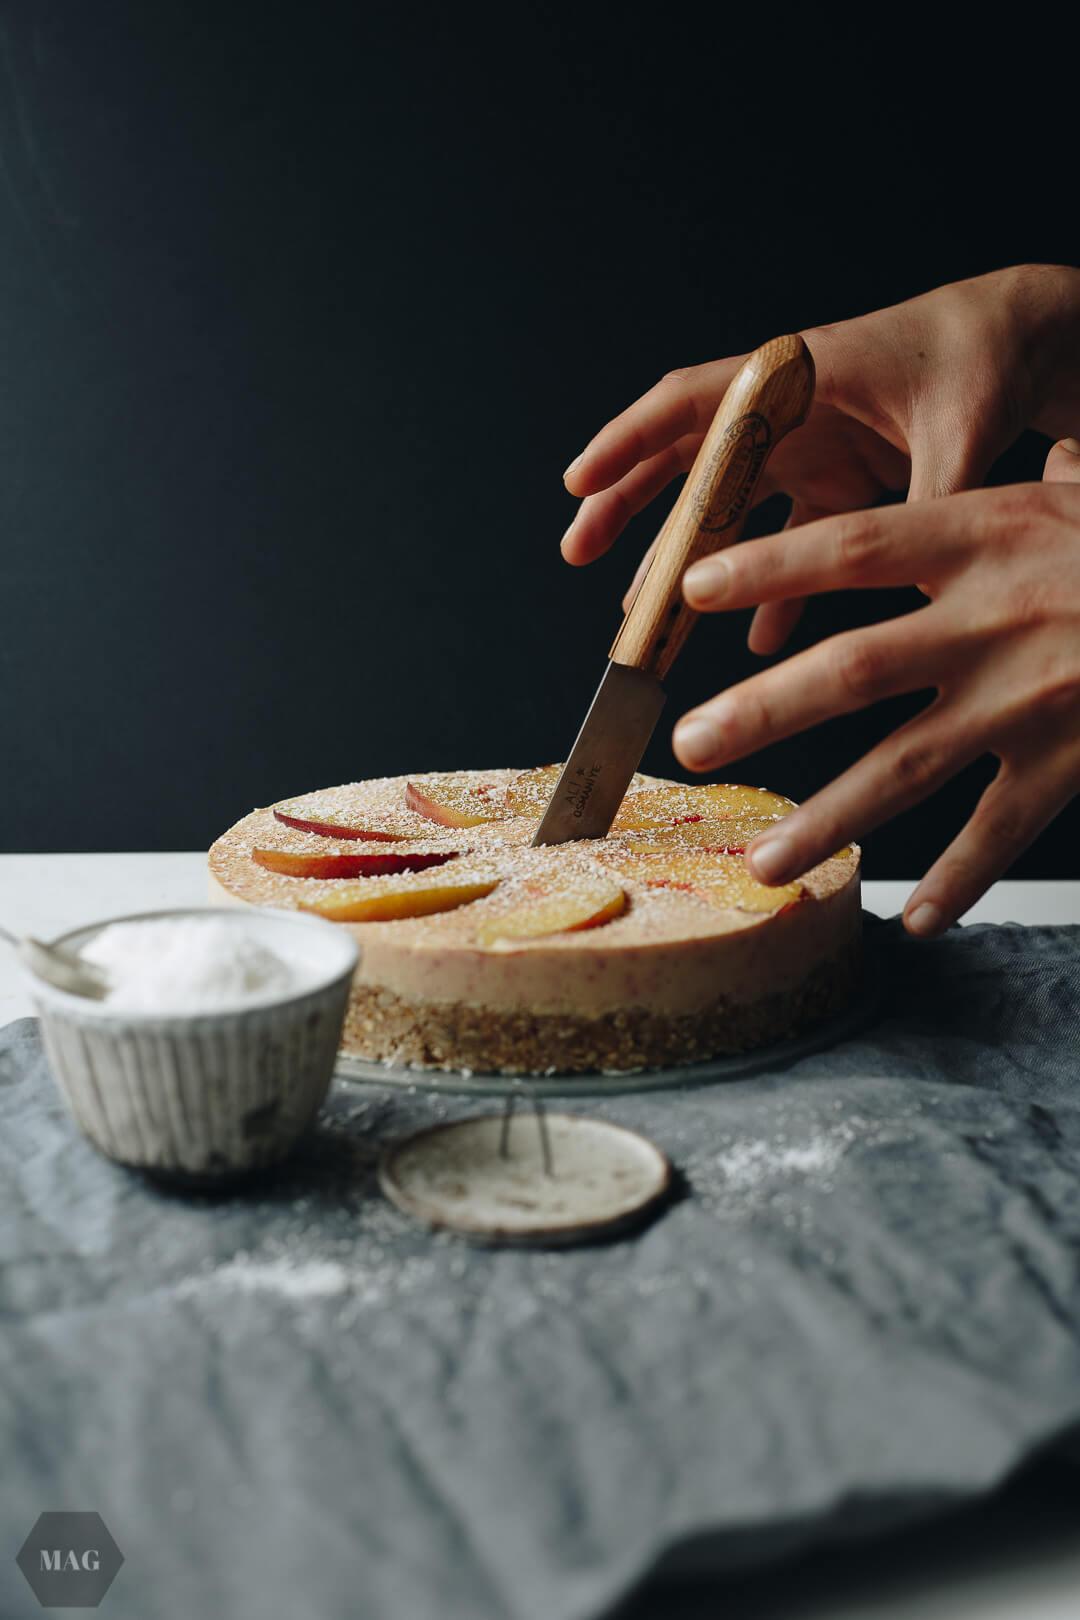 Nektarinen-Kuchen, Nektarinenkuchen vegan, Nektarinen Kuchen ohne Ei, NektarinenKuchen backen, Nektarinenkuchen ohne Zucker, Nektarinen kuchen rezept, Nektarinen Kuchen mit Sojajoghurt, Nektarinenkuchen no bake